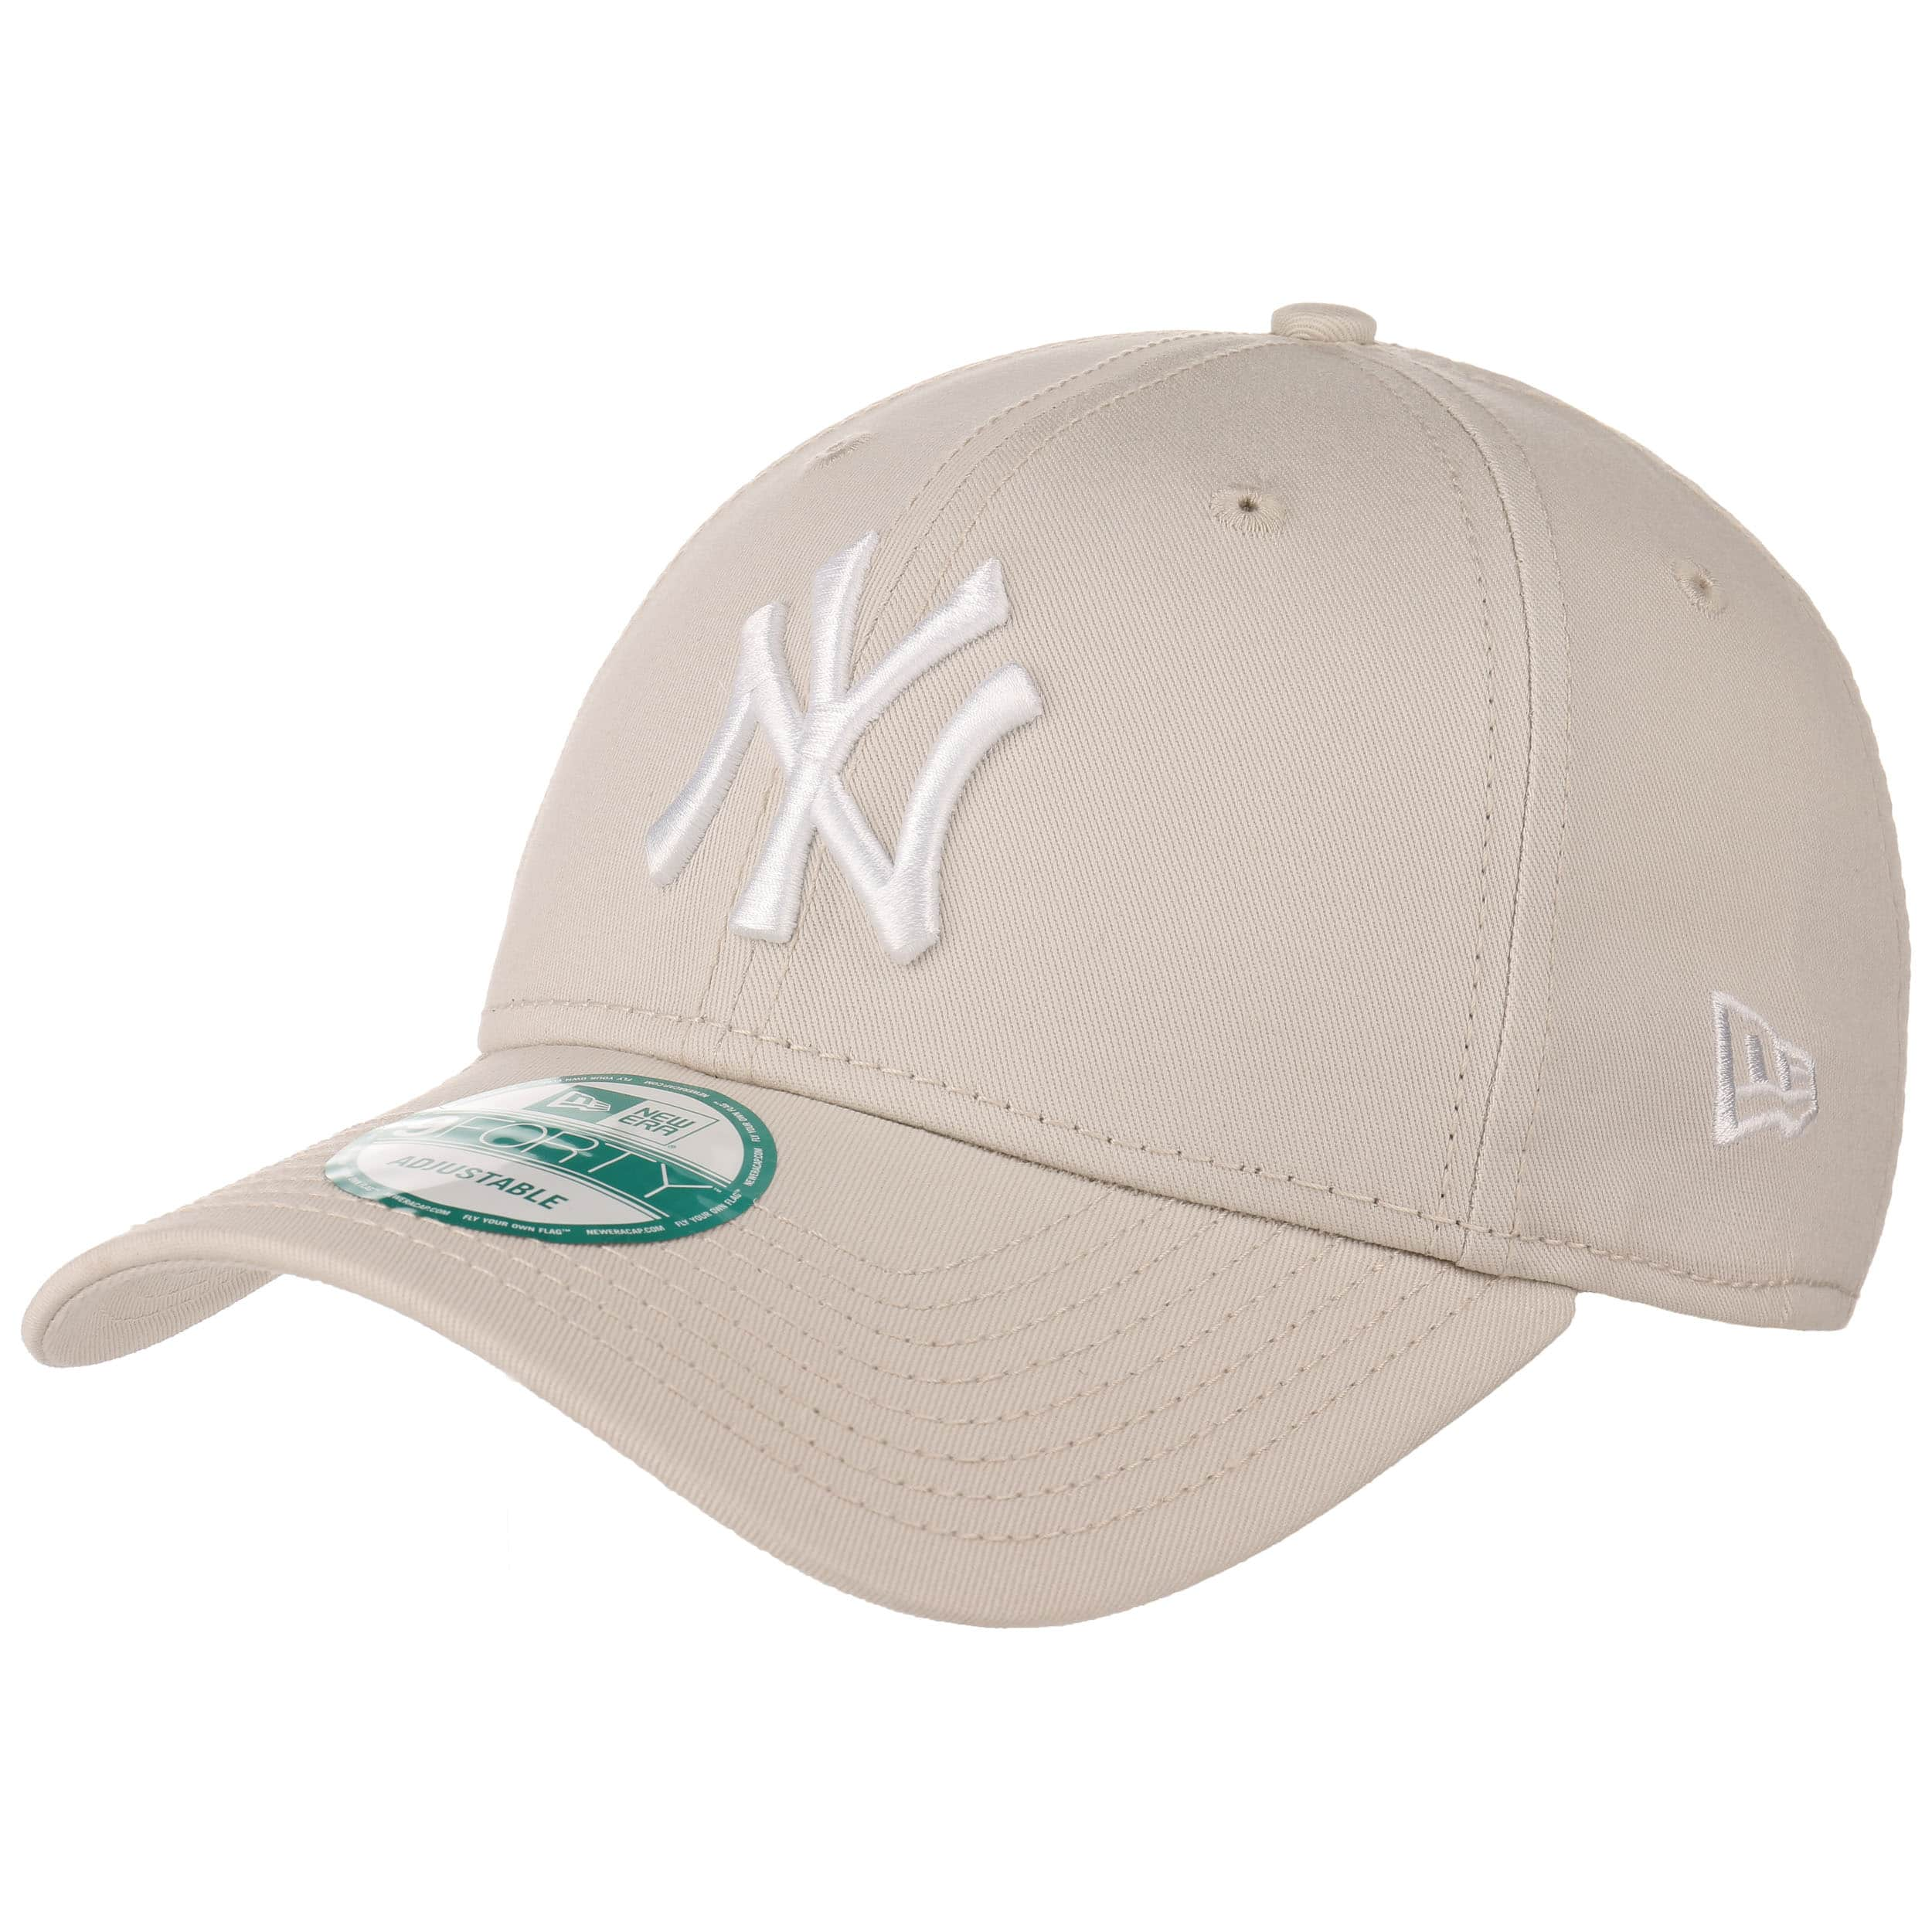 1ac0b5e762f ... 9Forty League Essential NY Cap by New Era - oatmeal 5 ...